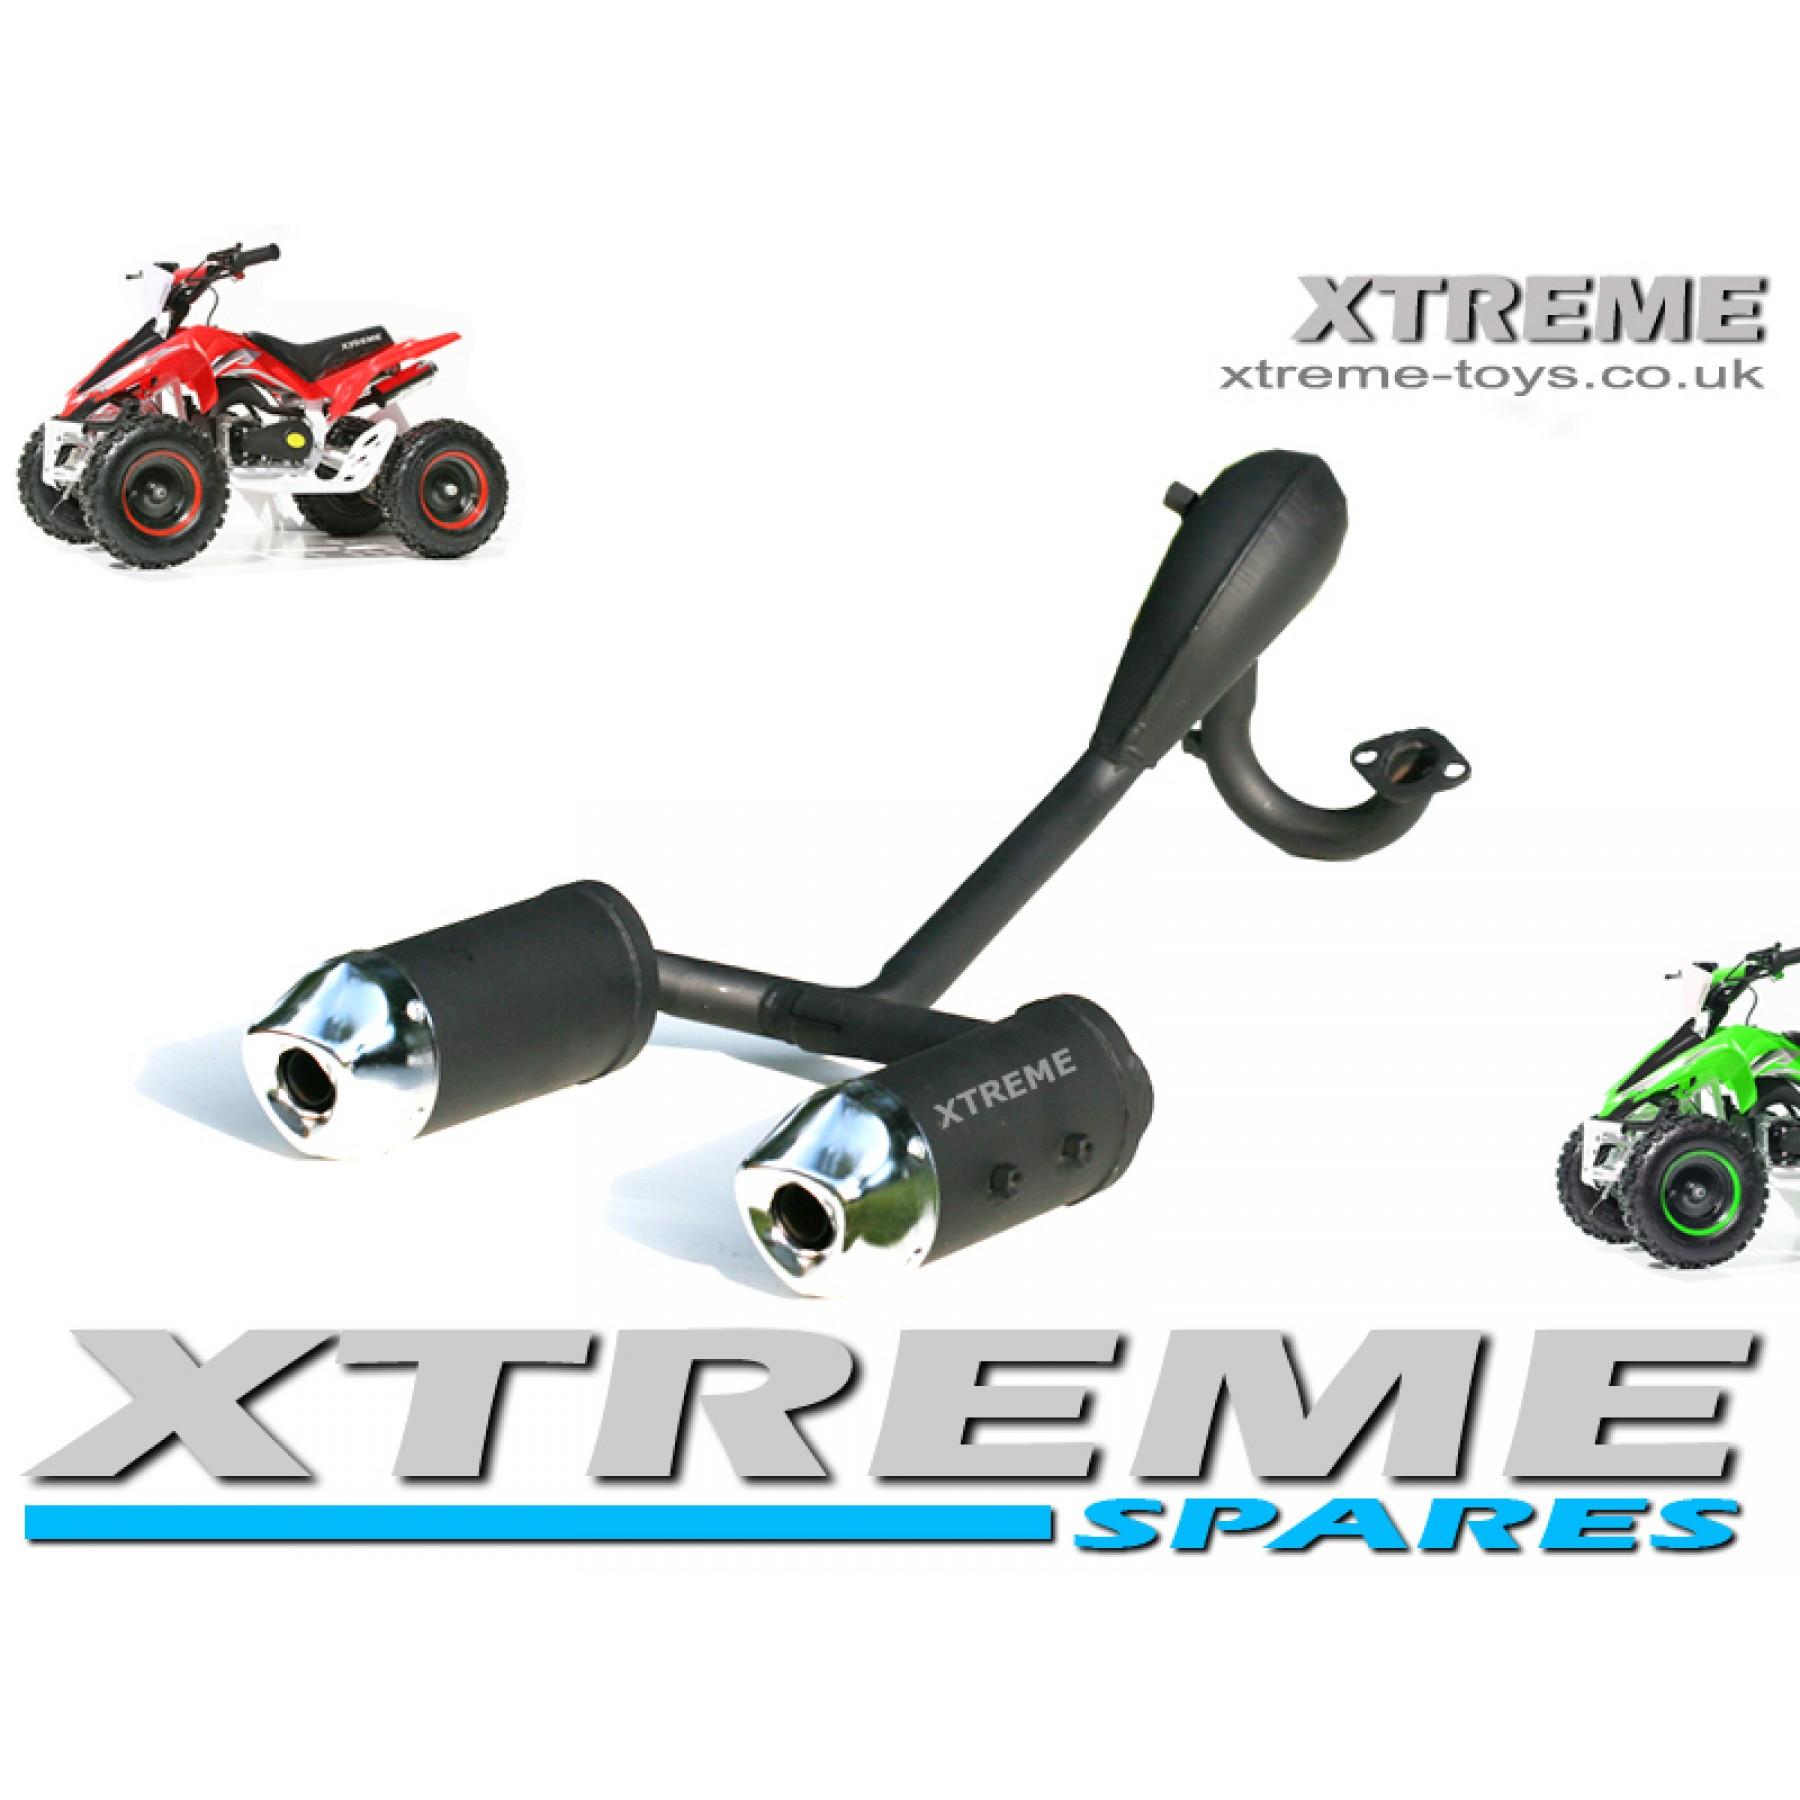 MINI MOTO / QUAD BIKE / ATV / DOUBLE TWIN EXHAUST PIPE MUFFLER CHROME 49-50cc